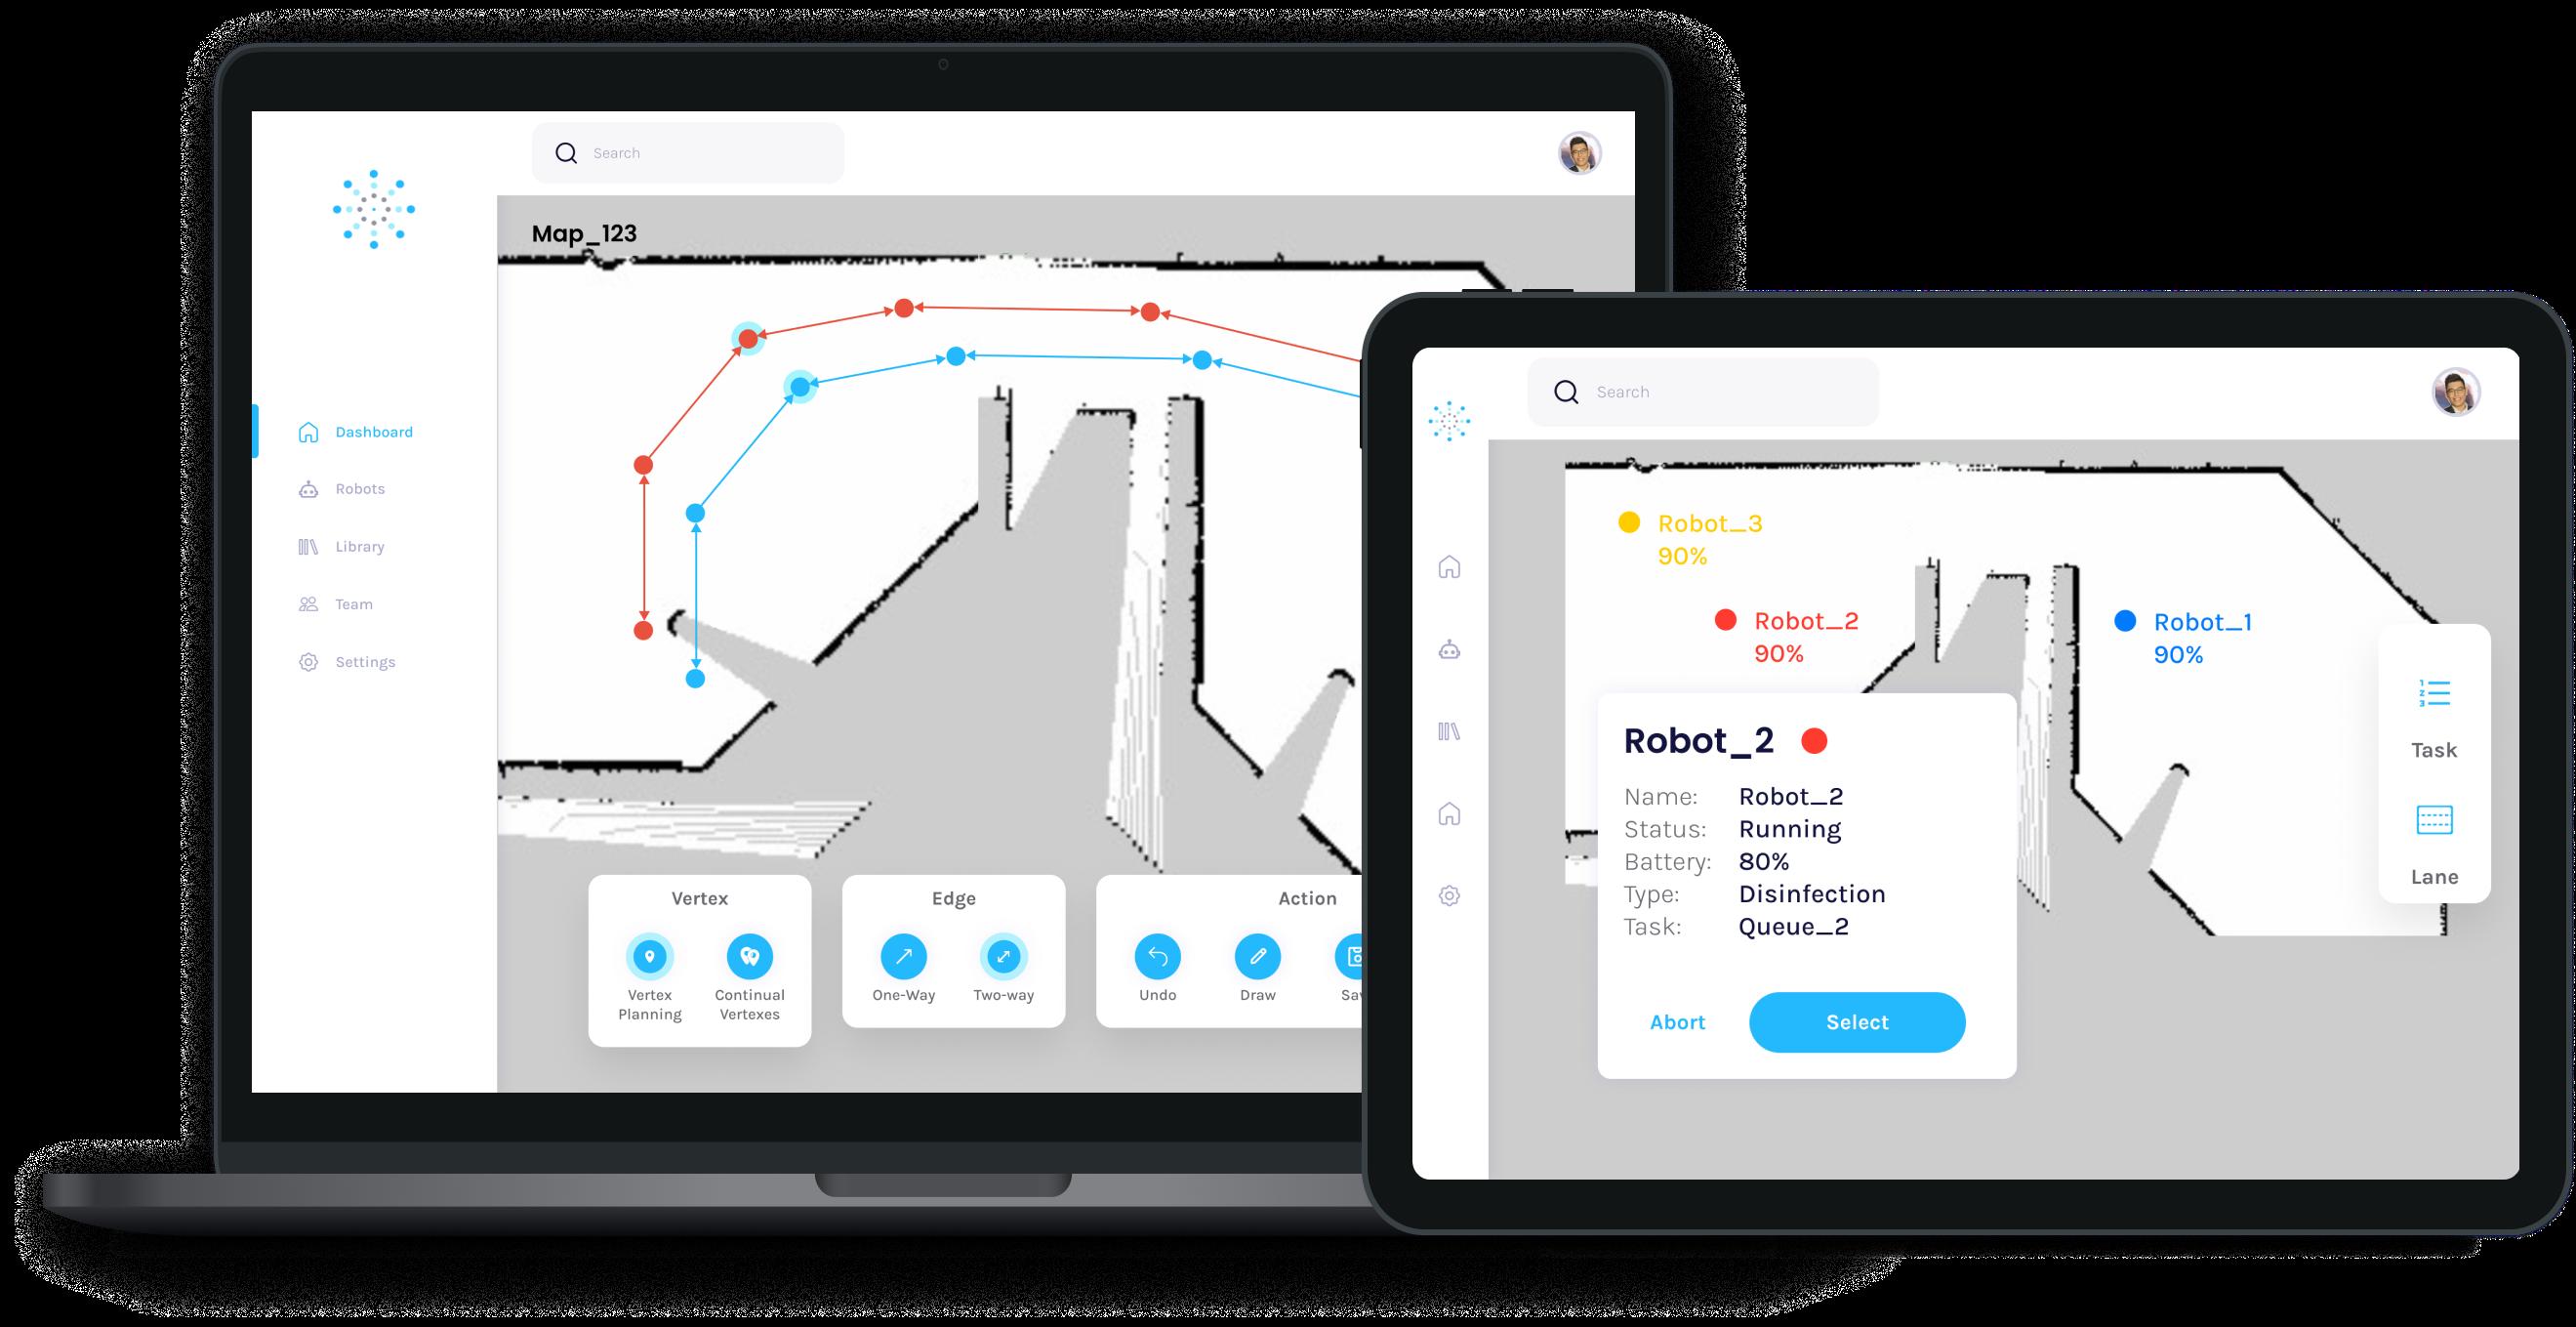 Seirios: Manage multiple robots using fleet management system